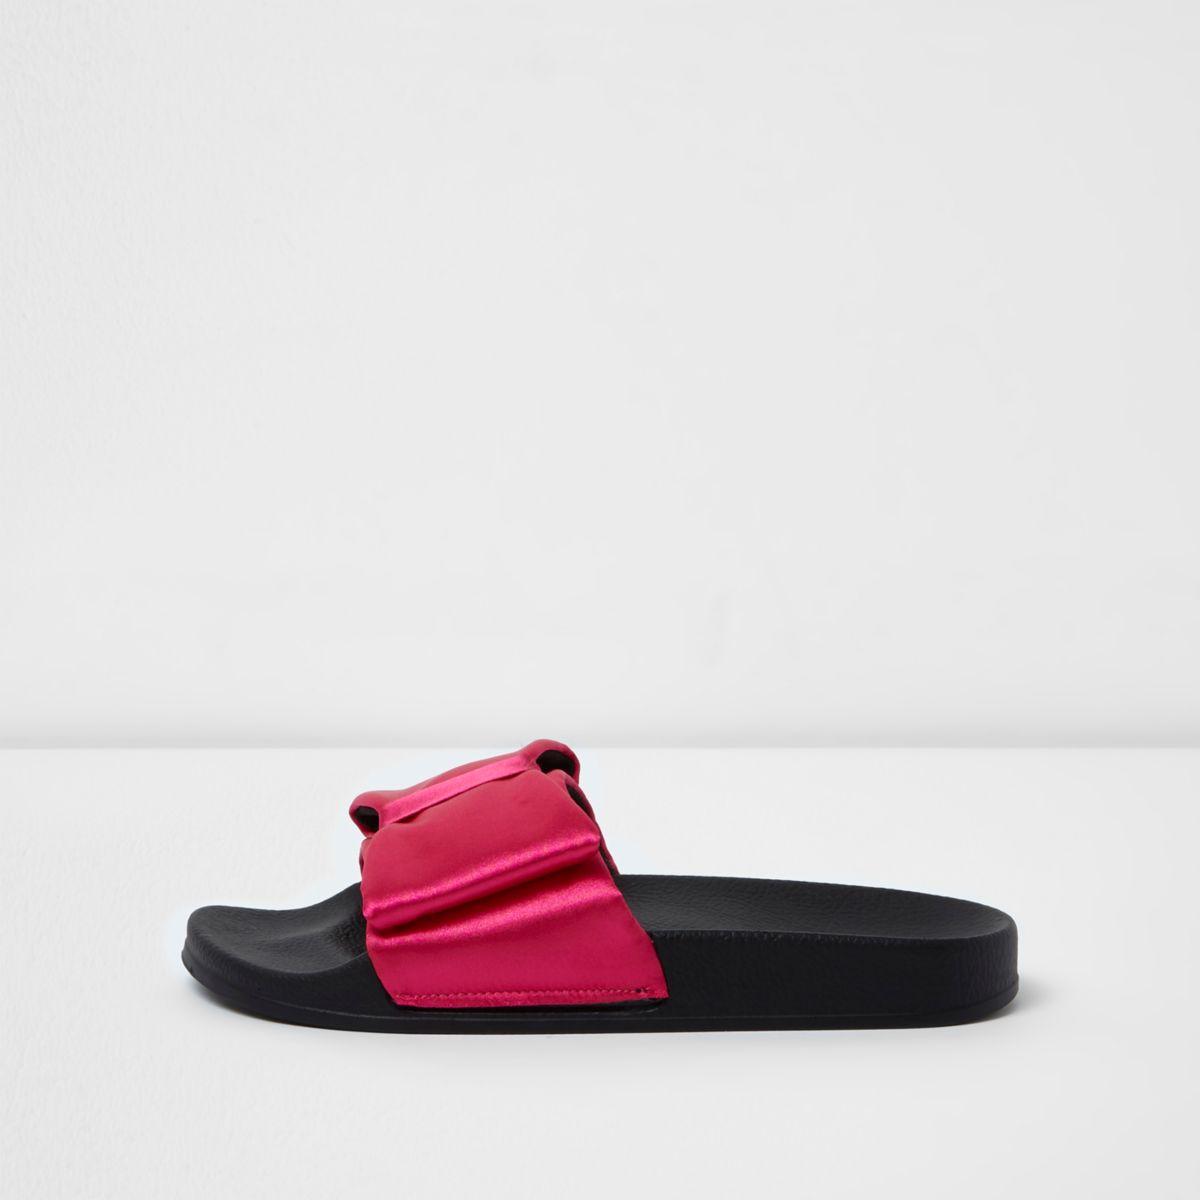 Pink satin bow sliders